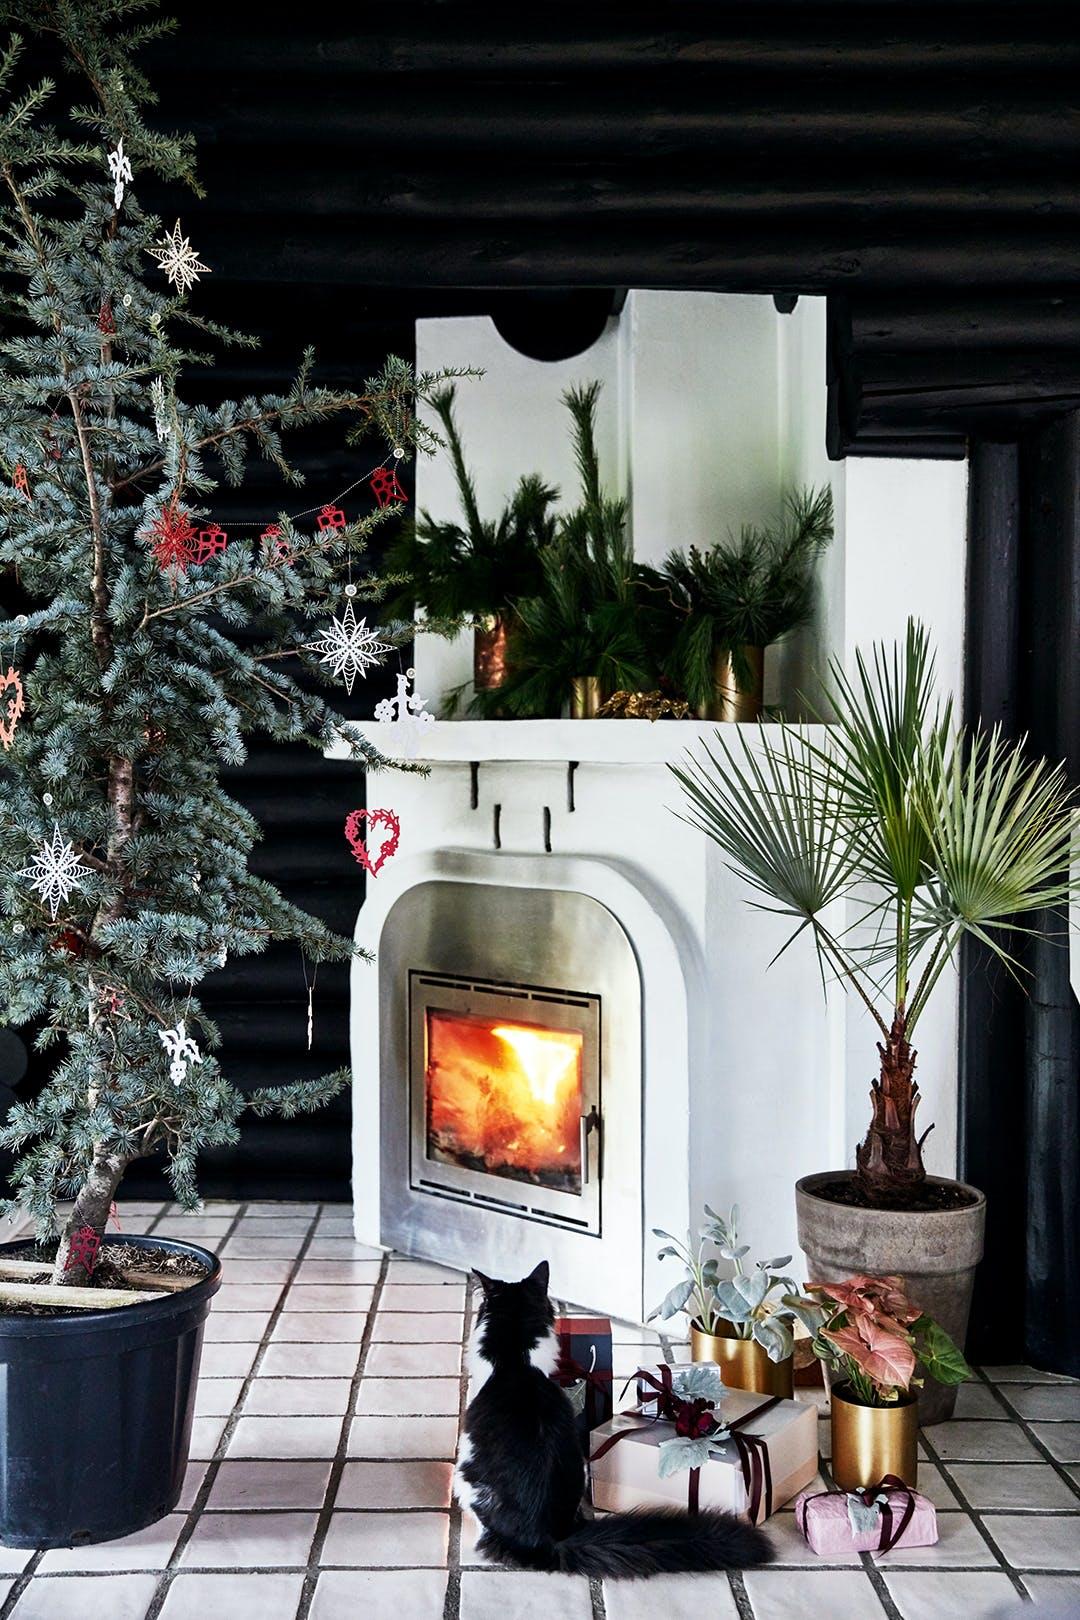 brændeovn kamin jul juletræ pynt julepynt juledekoration